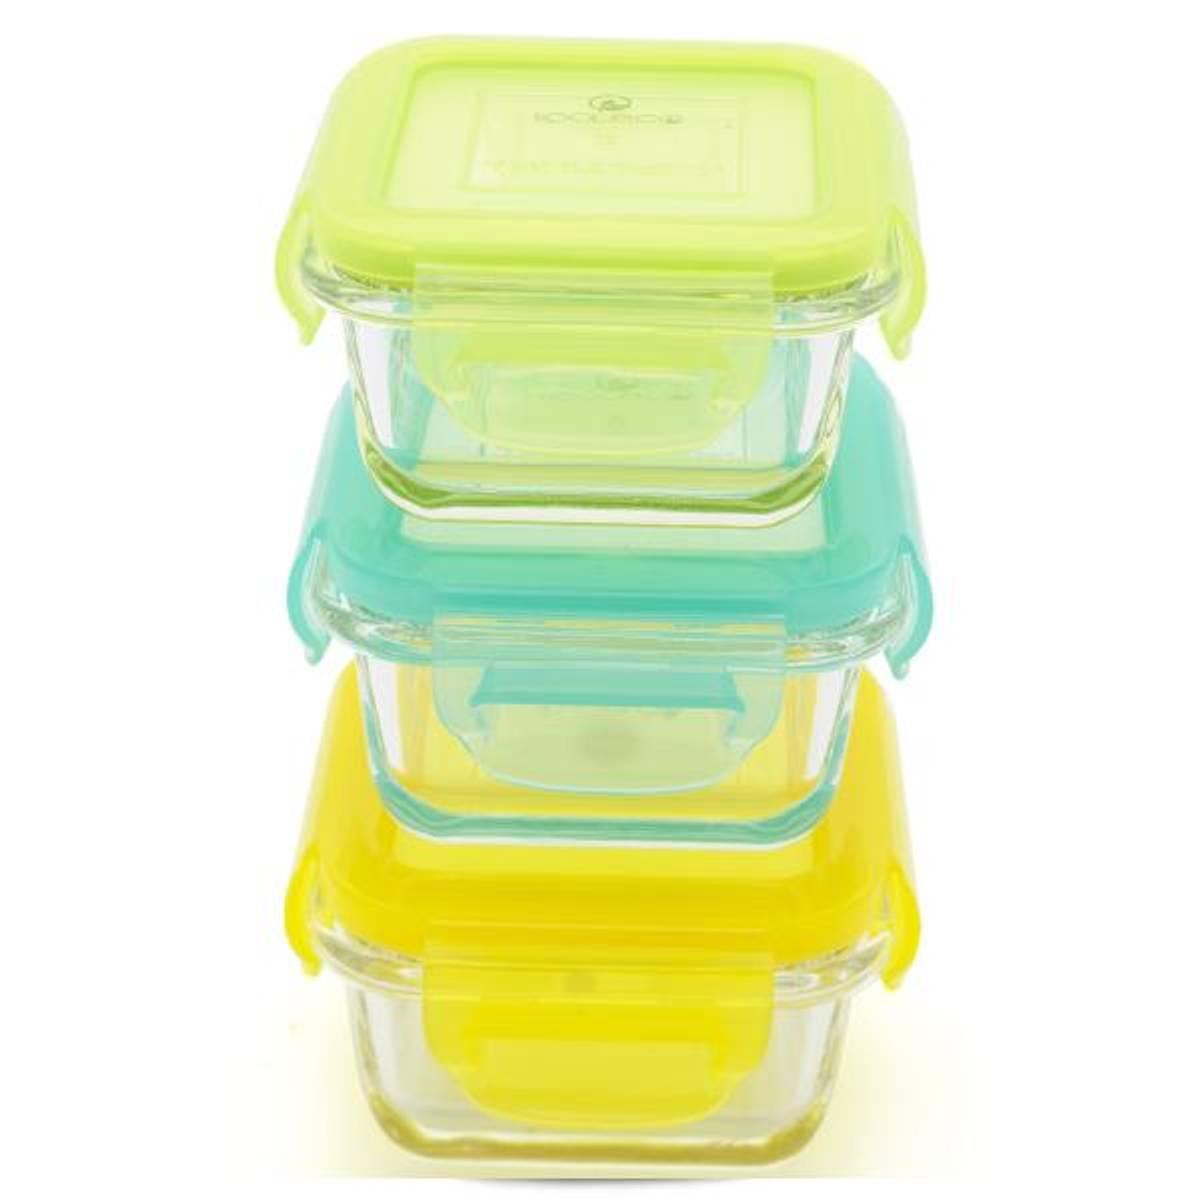 Kooleco glassbeholdere Cubes 3 pk 150ml